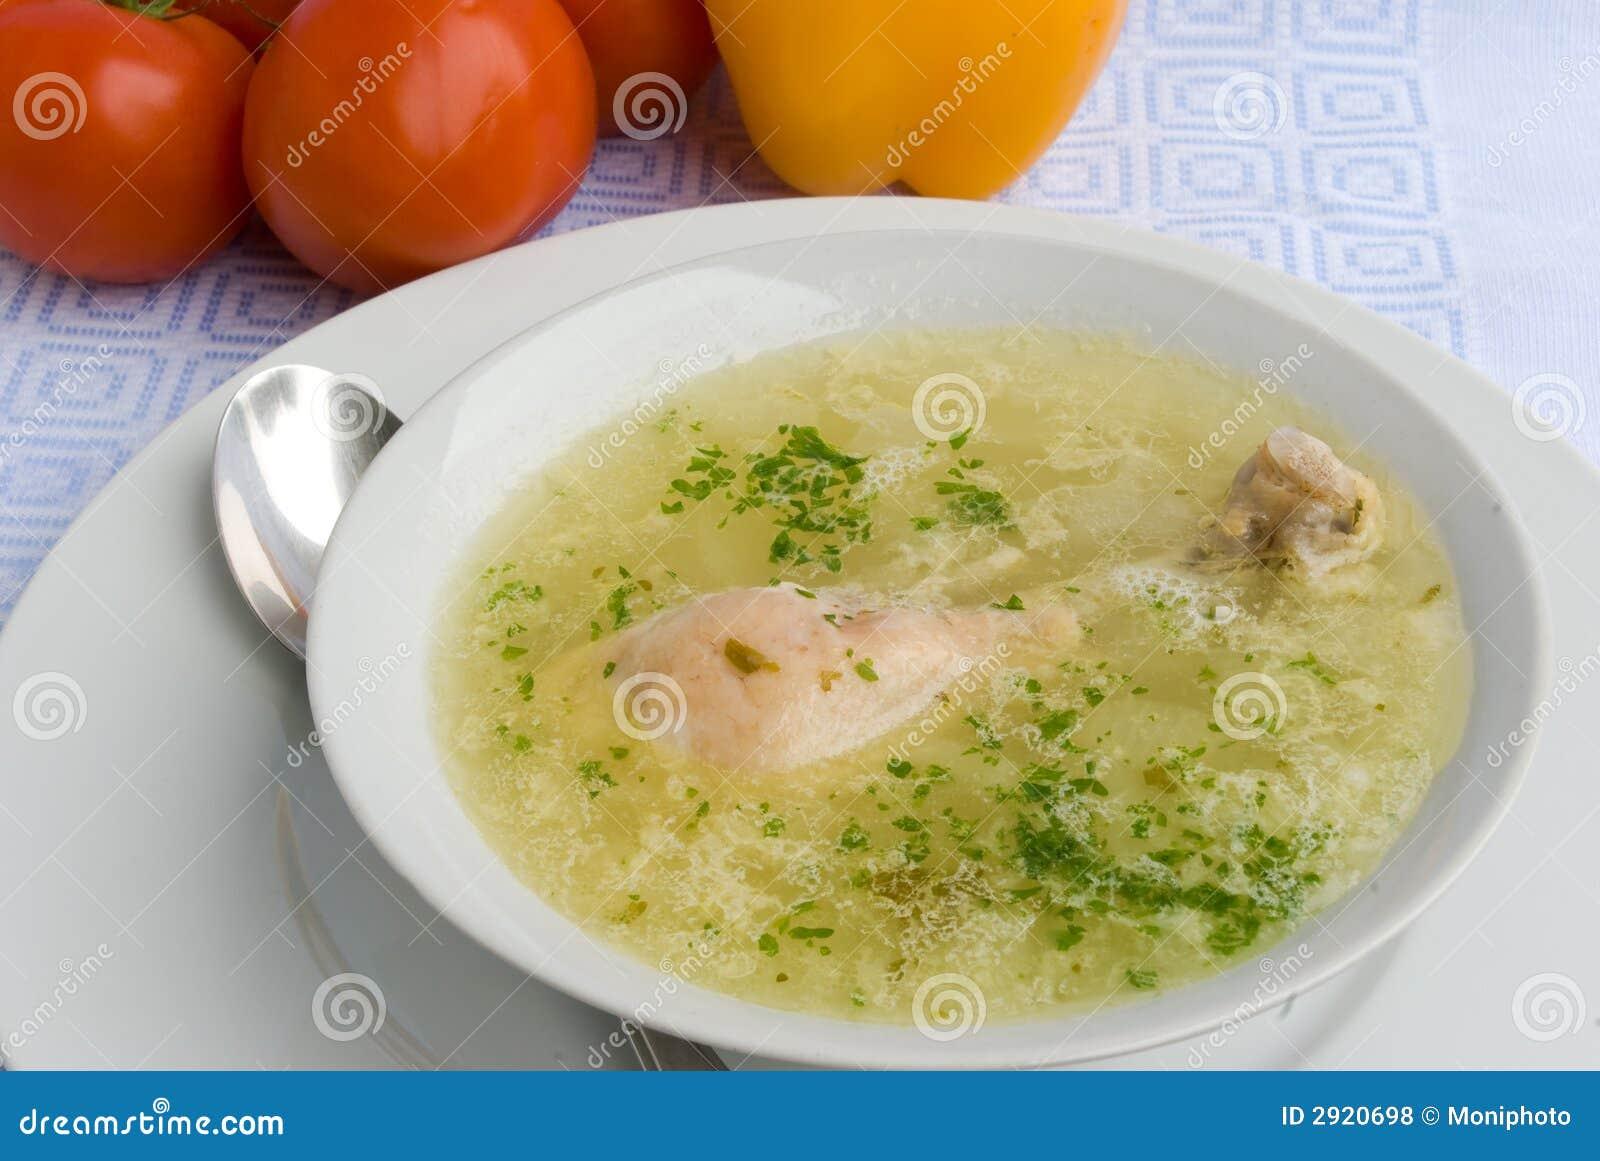 Chicken soup with chicken leg